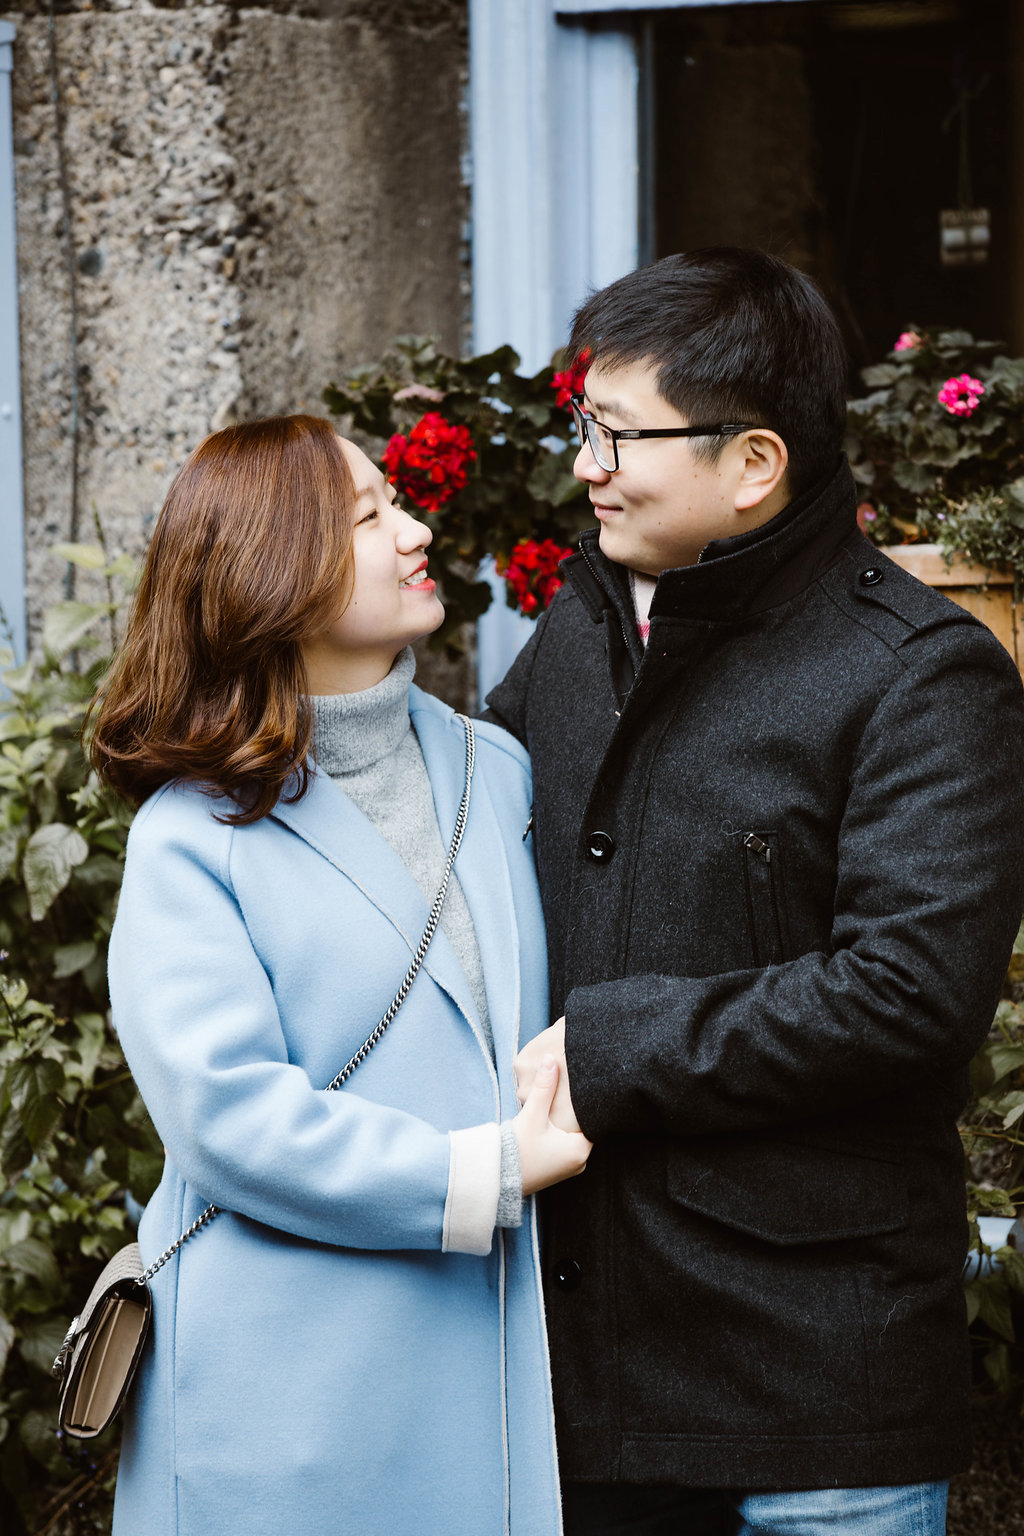 Qian+Jacson_best+Seattle+wedding+Photographer_APW6.JPG